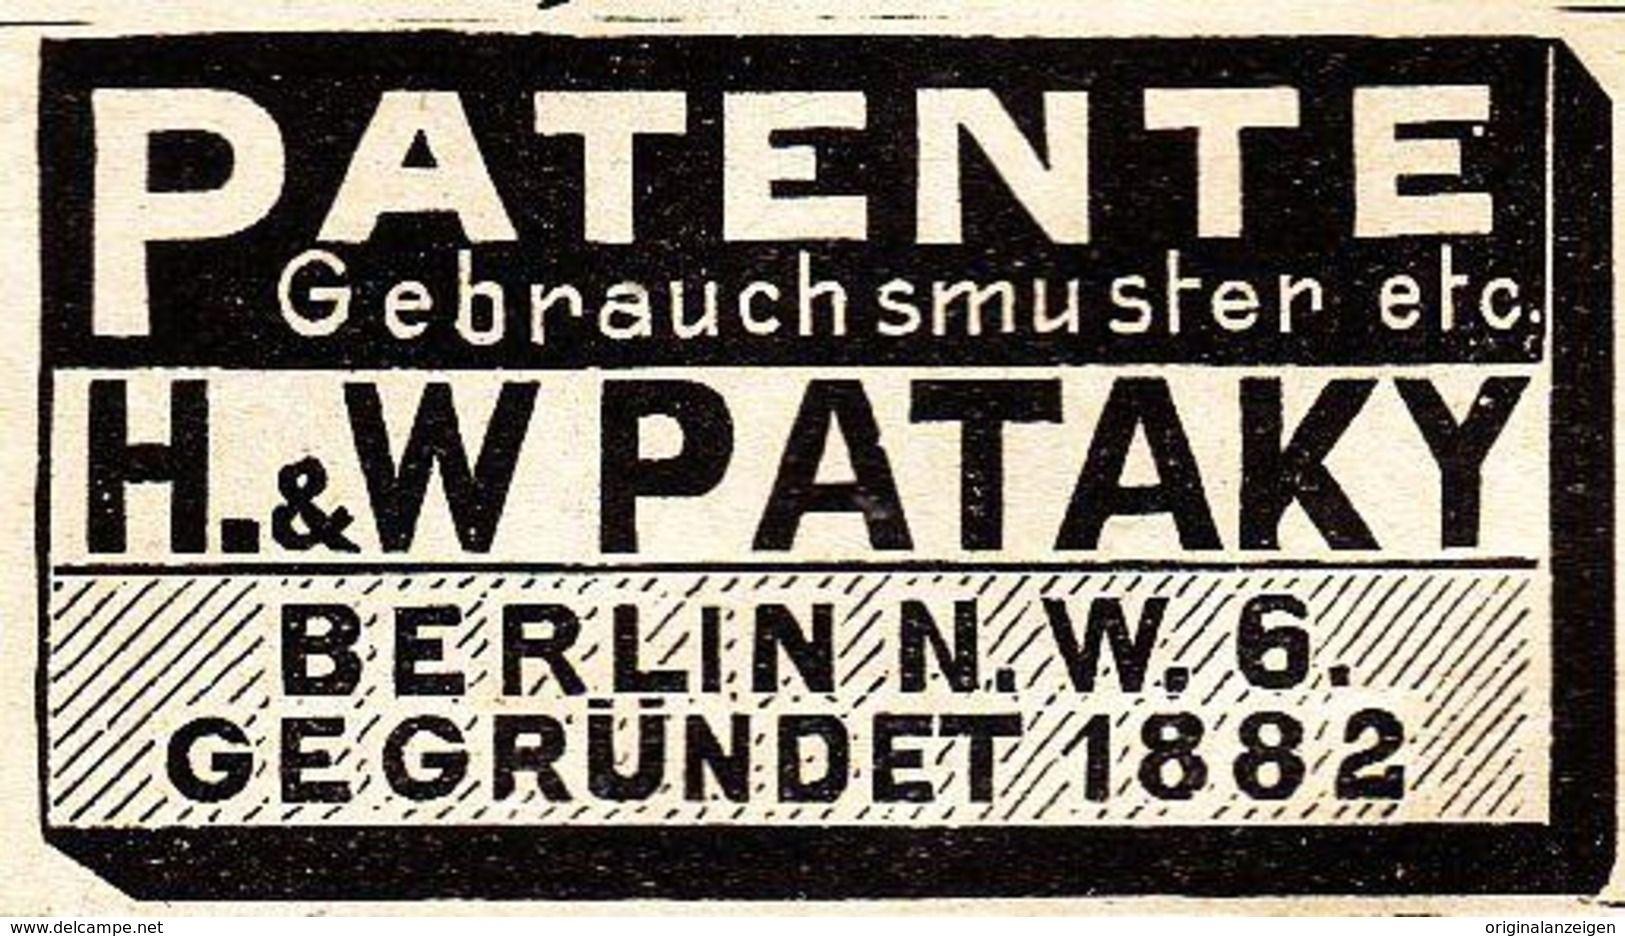 OriginalWerbung/ Anzeige 1901 PATENTE PATAKY BERLIN